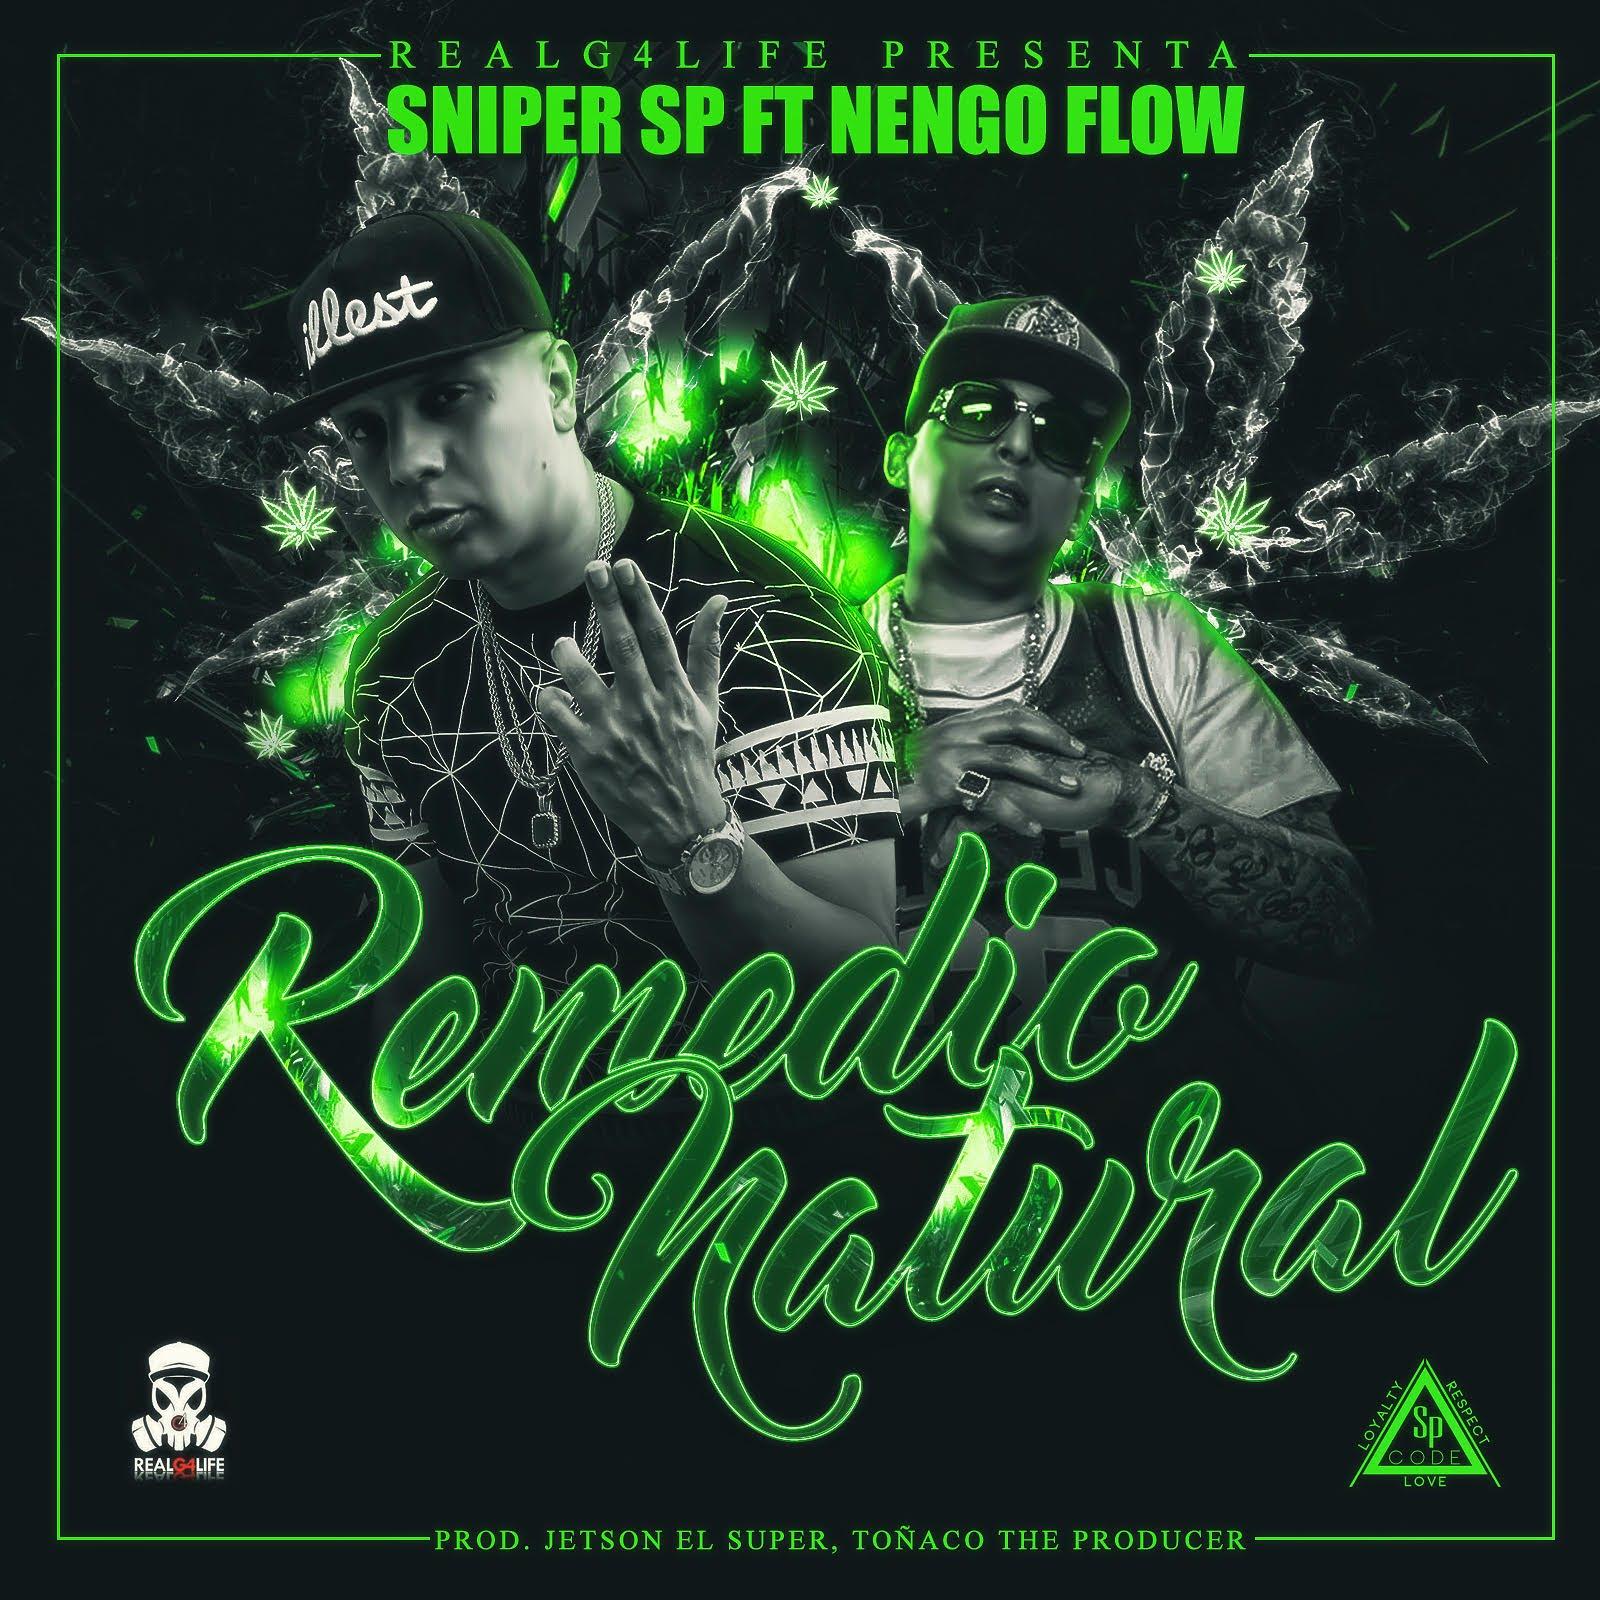 sniper sp ft nengo flow remedio - Sniper SP Ft. Nengo Flow – Remedio Natural (Video Lyric)